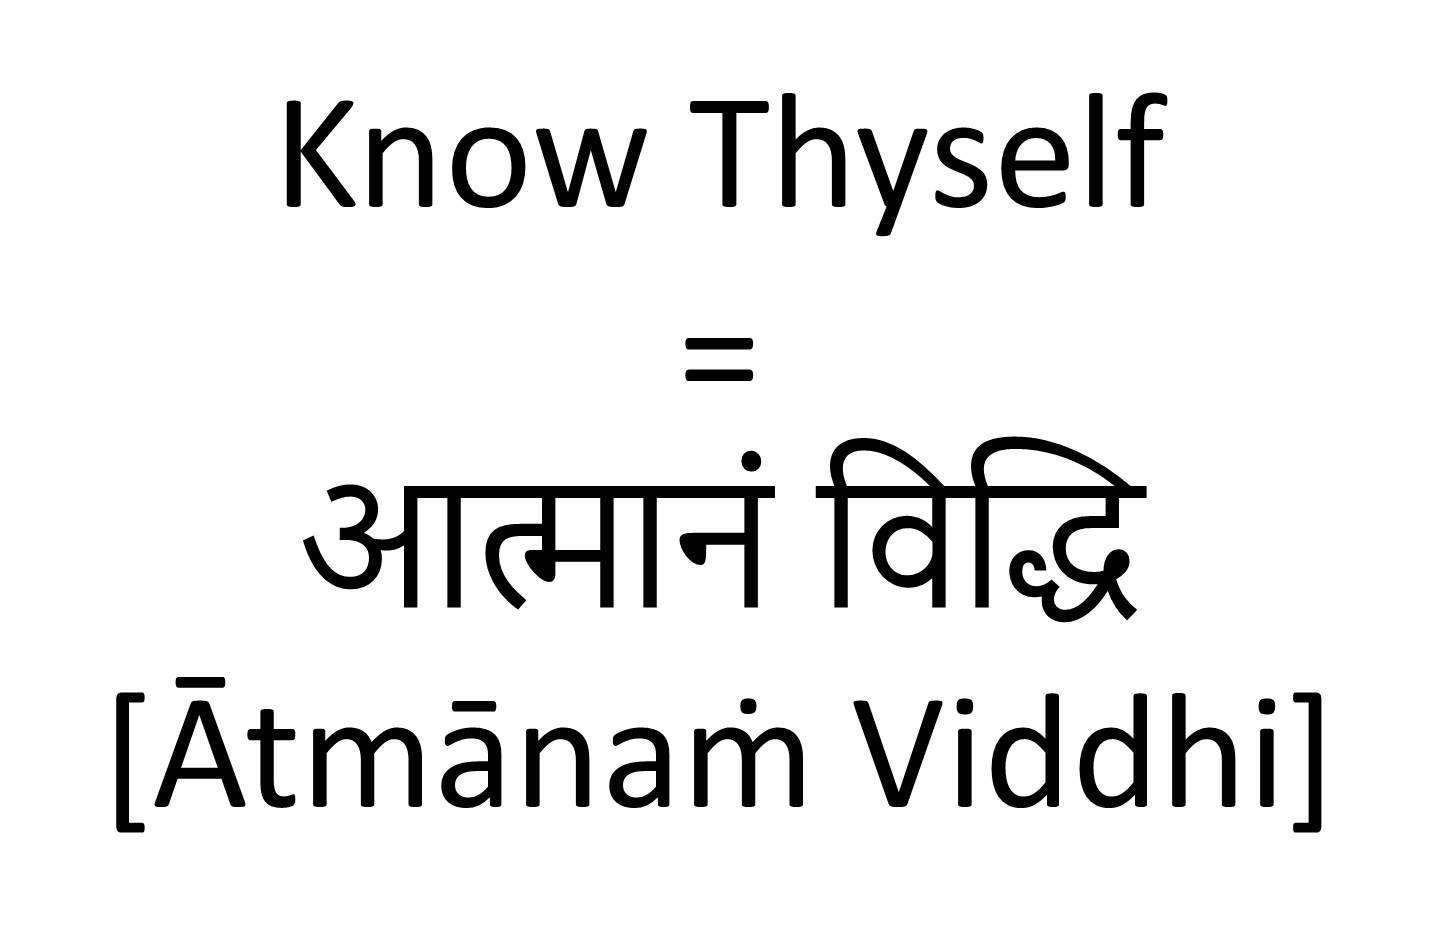 How to Say Know Thyself in Sanskrit | Sanskrit Tattoos ...